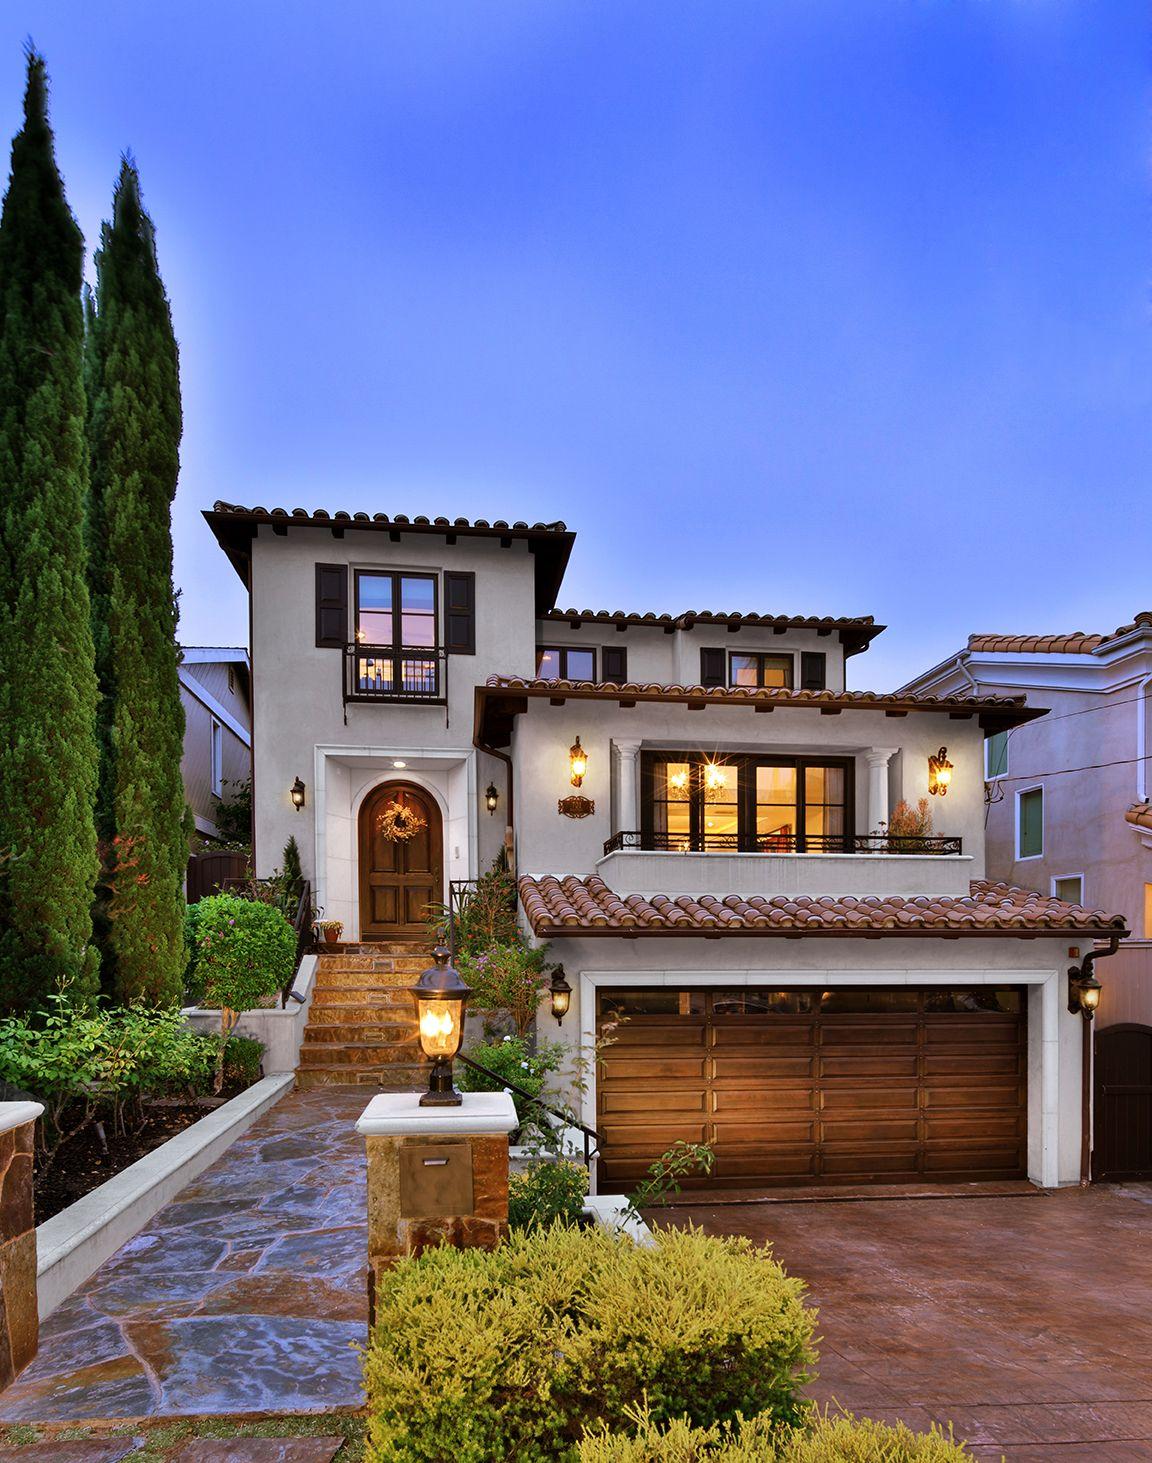 Luxury Spanish Villa Style Home Exterior Spanish Style Homes